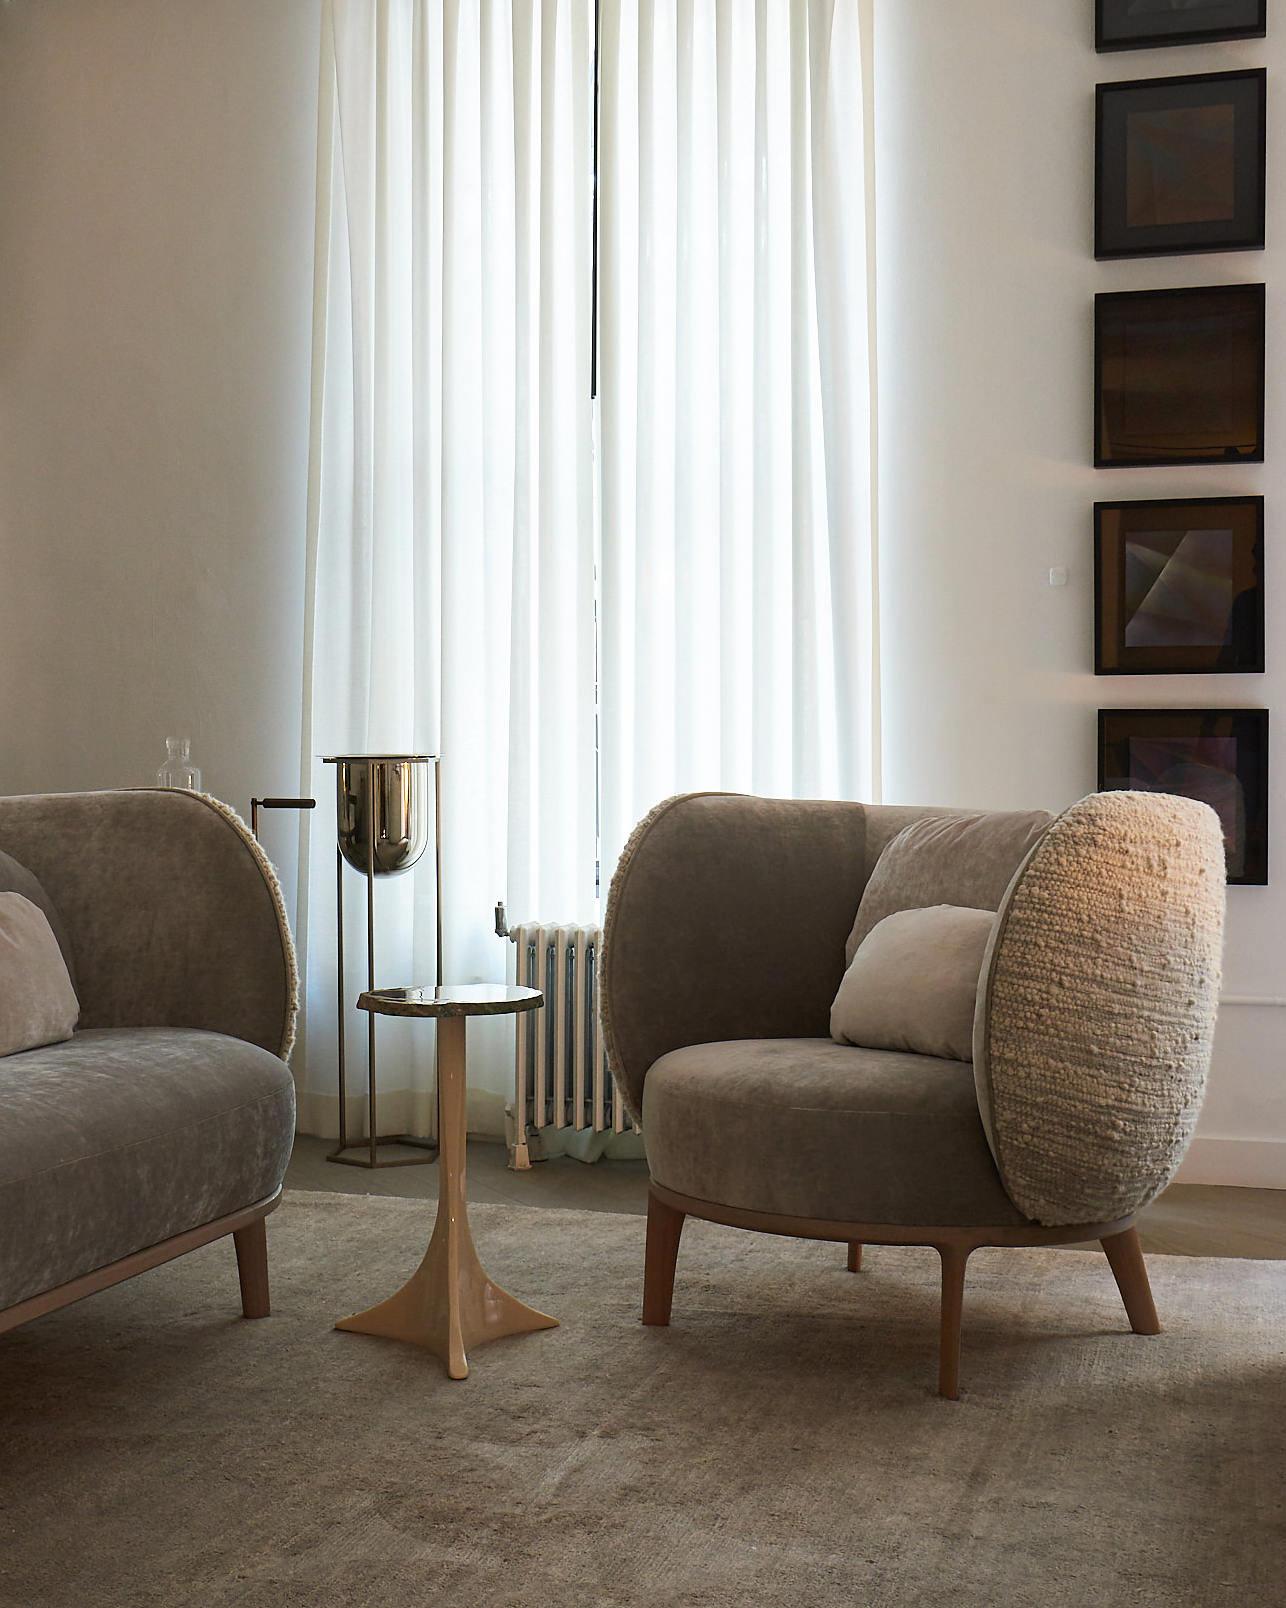 8A, Avenue Road Furniture, New York City